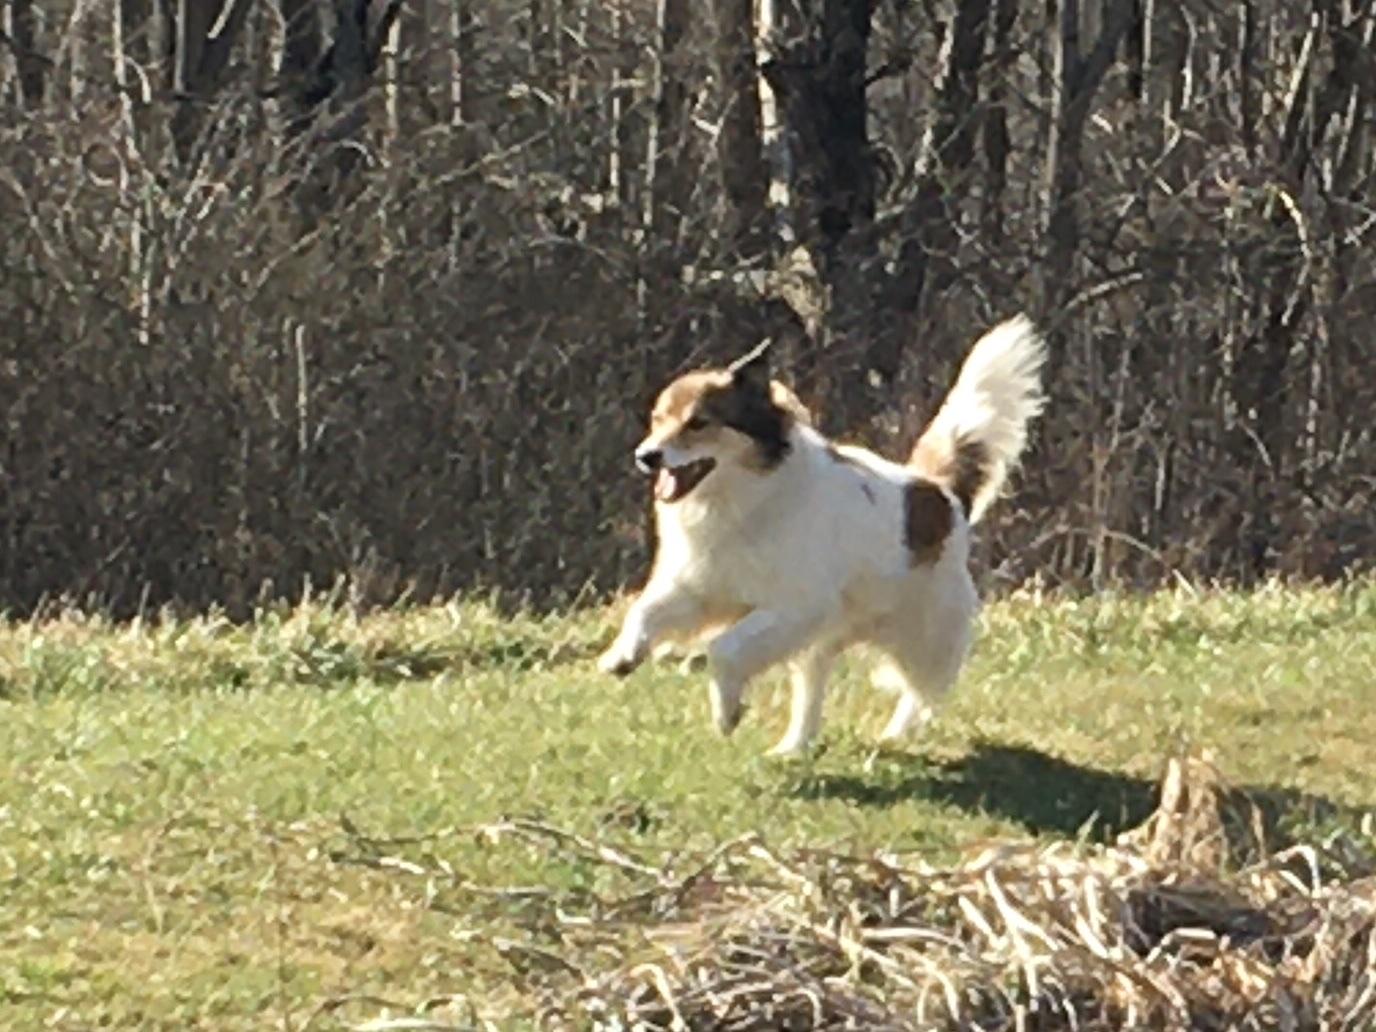 Dog returning